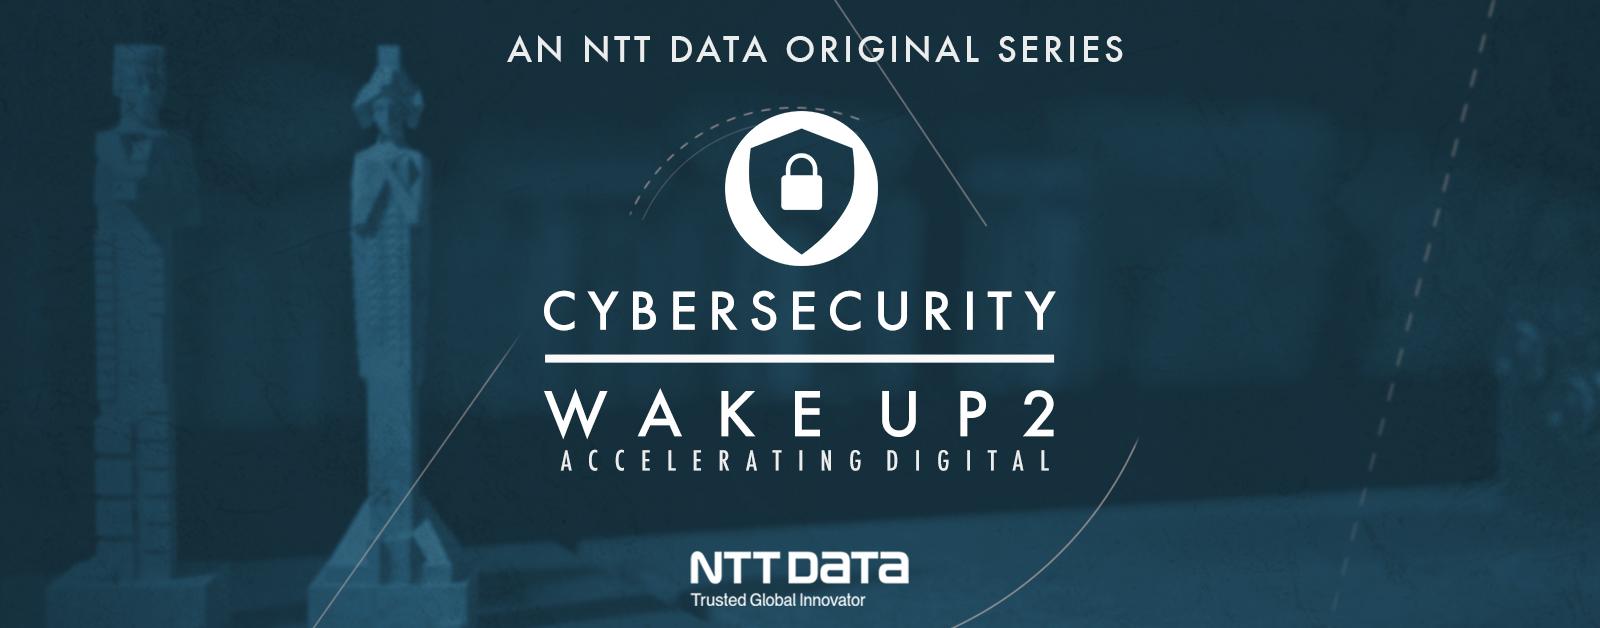 Wake Up 2 Ciberseguridad